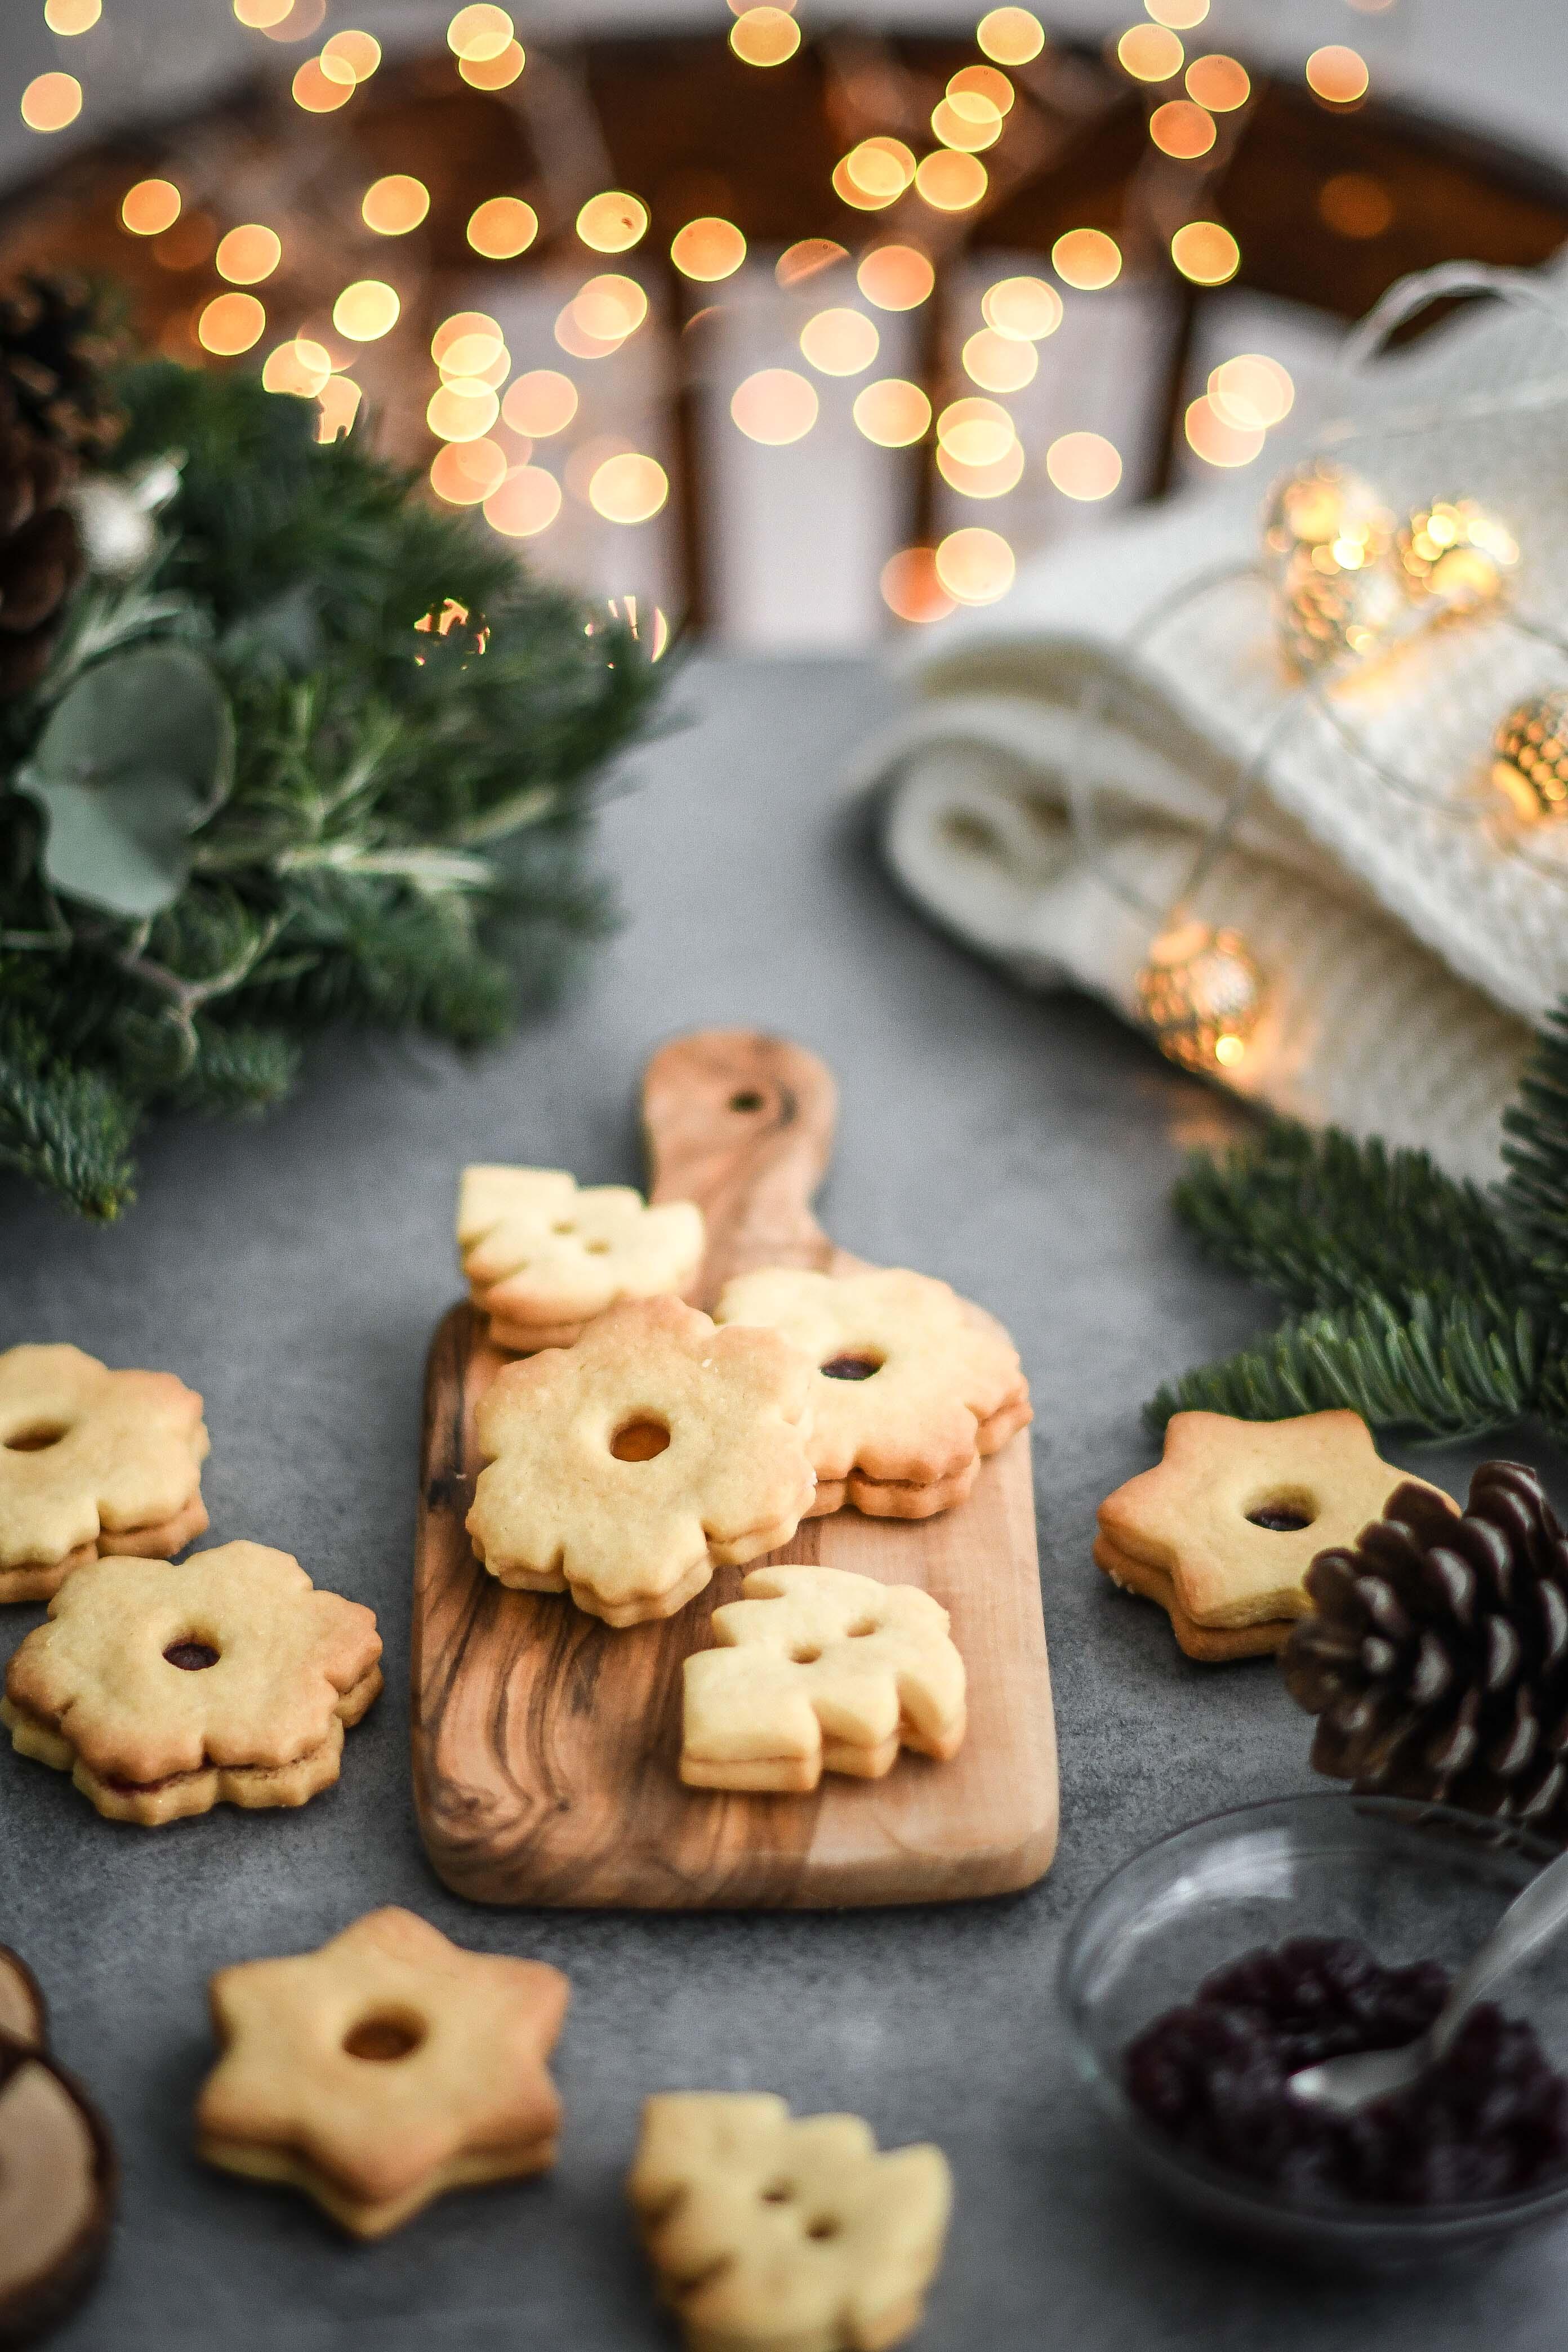 linecke kolaciky linzer cookies